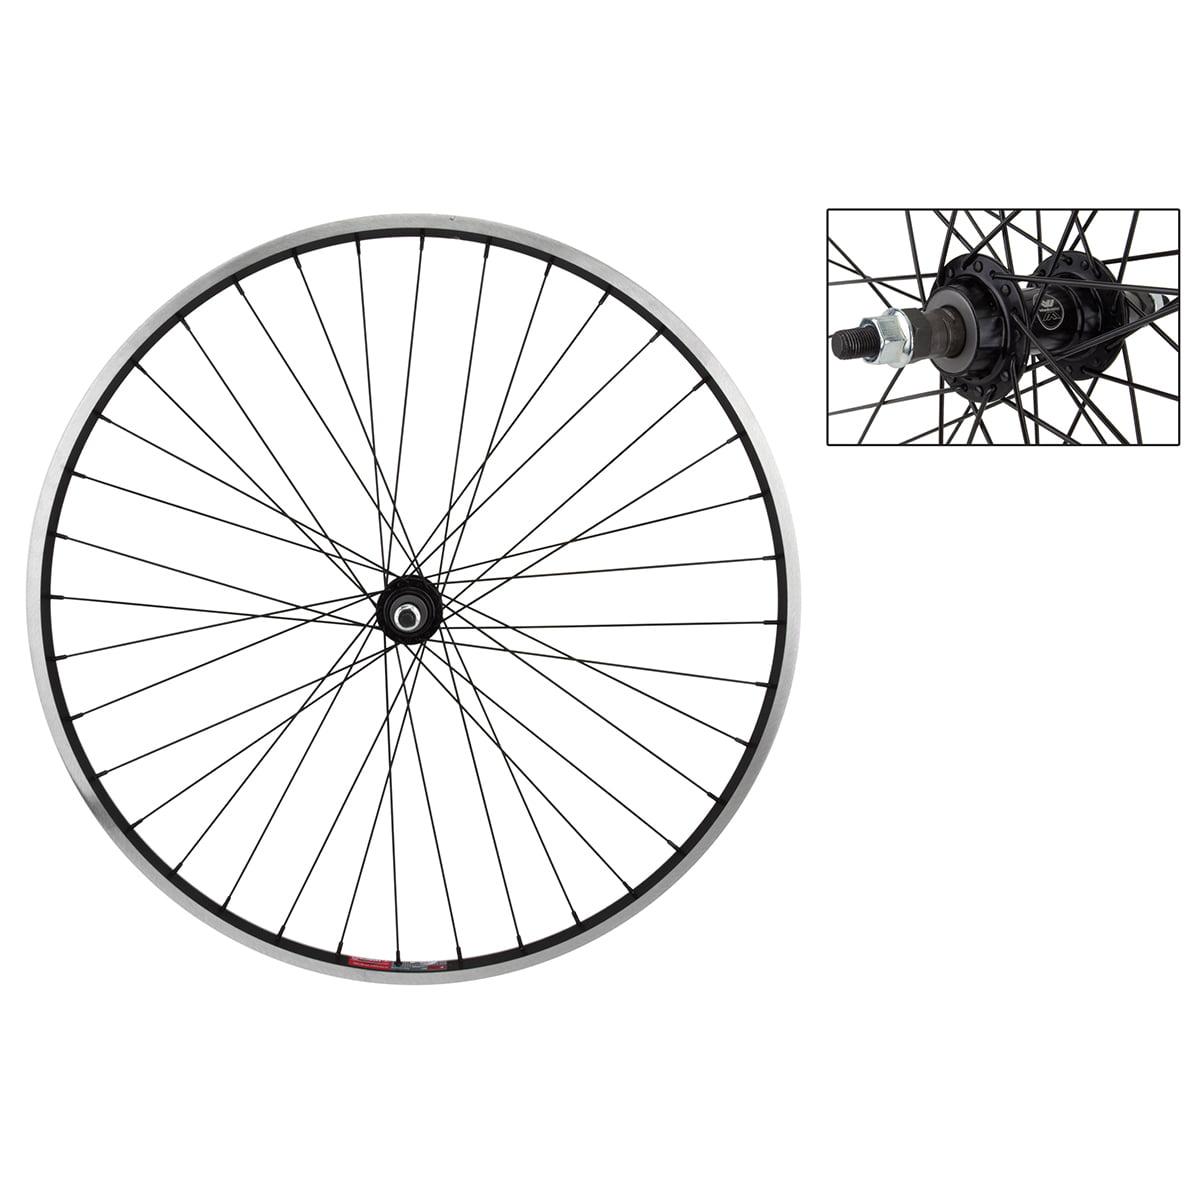 Wheel Rear 26X1.75 Stl Bk 36 Stl Fw 5//6//7Sp Bk 135Mm 14Gbk